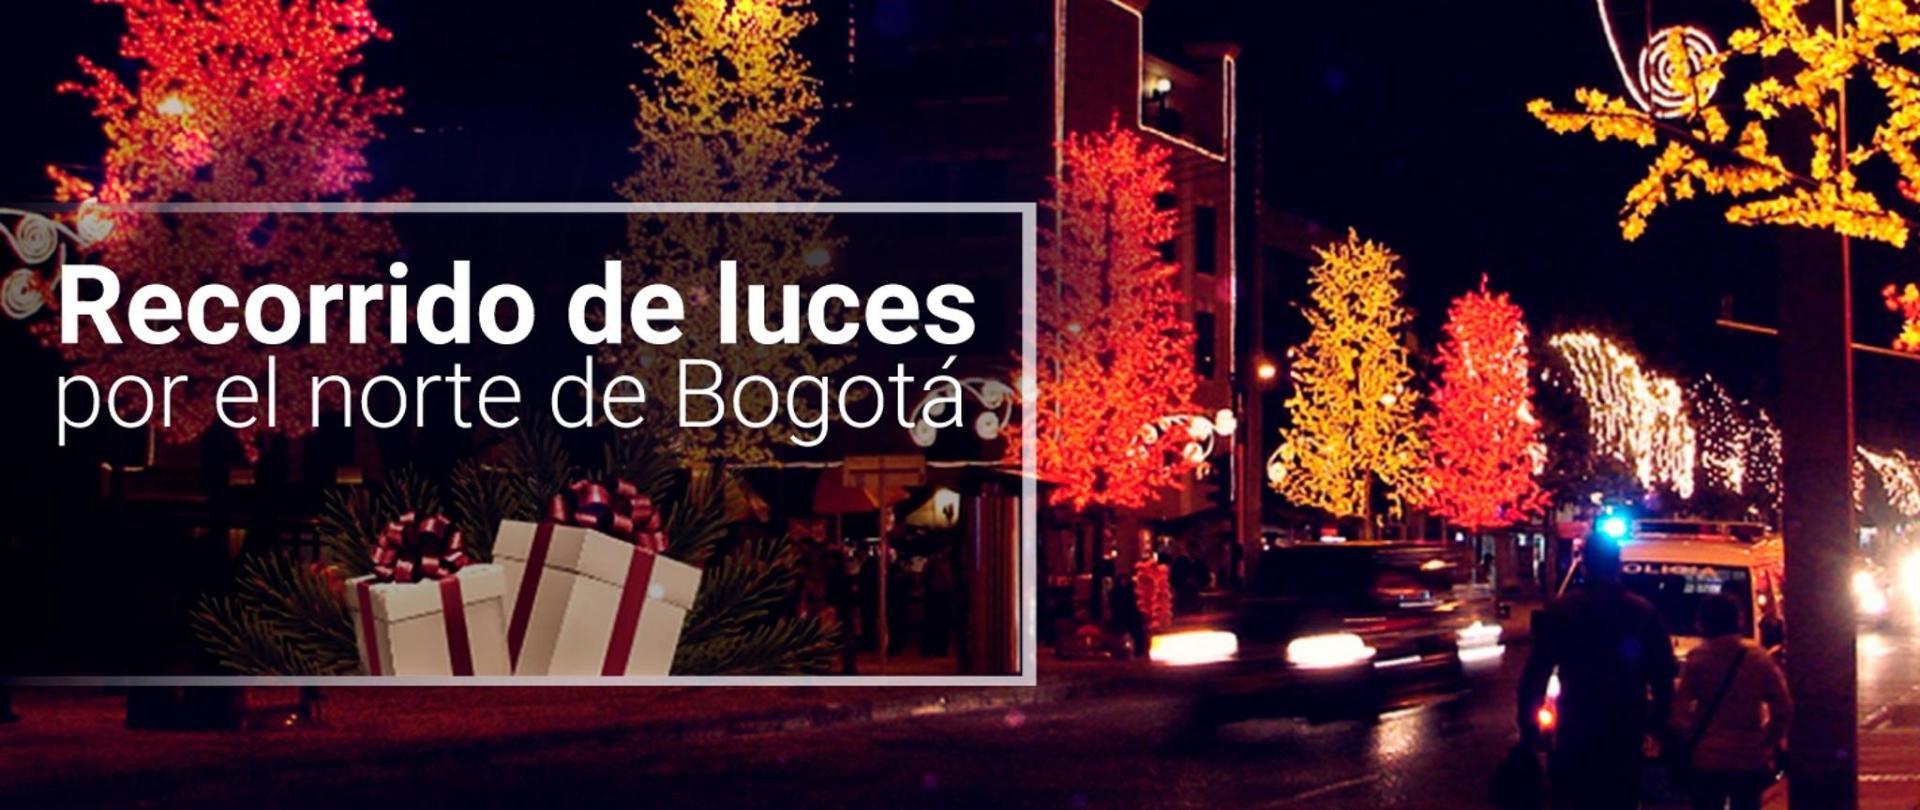 www.jazzapartments.com-navidad-recorrido-luces.png